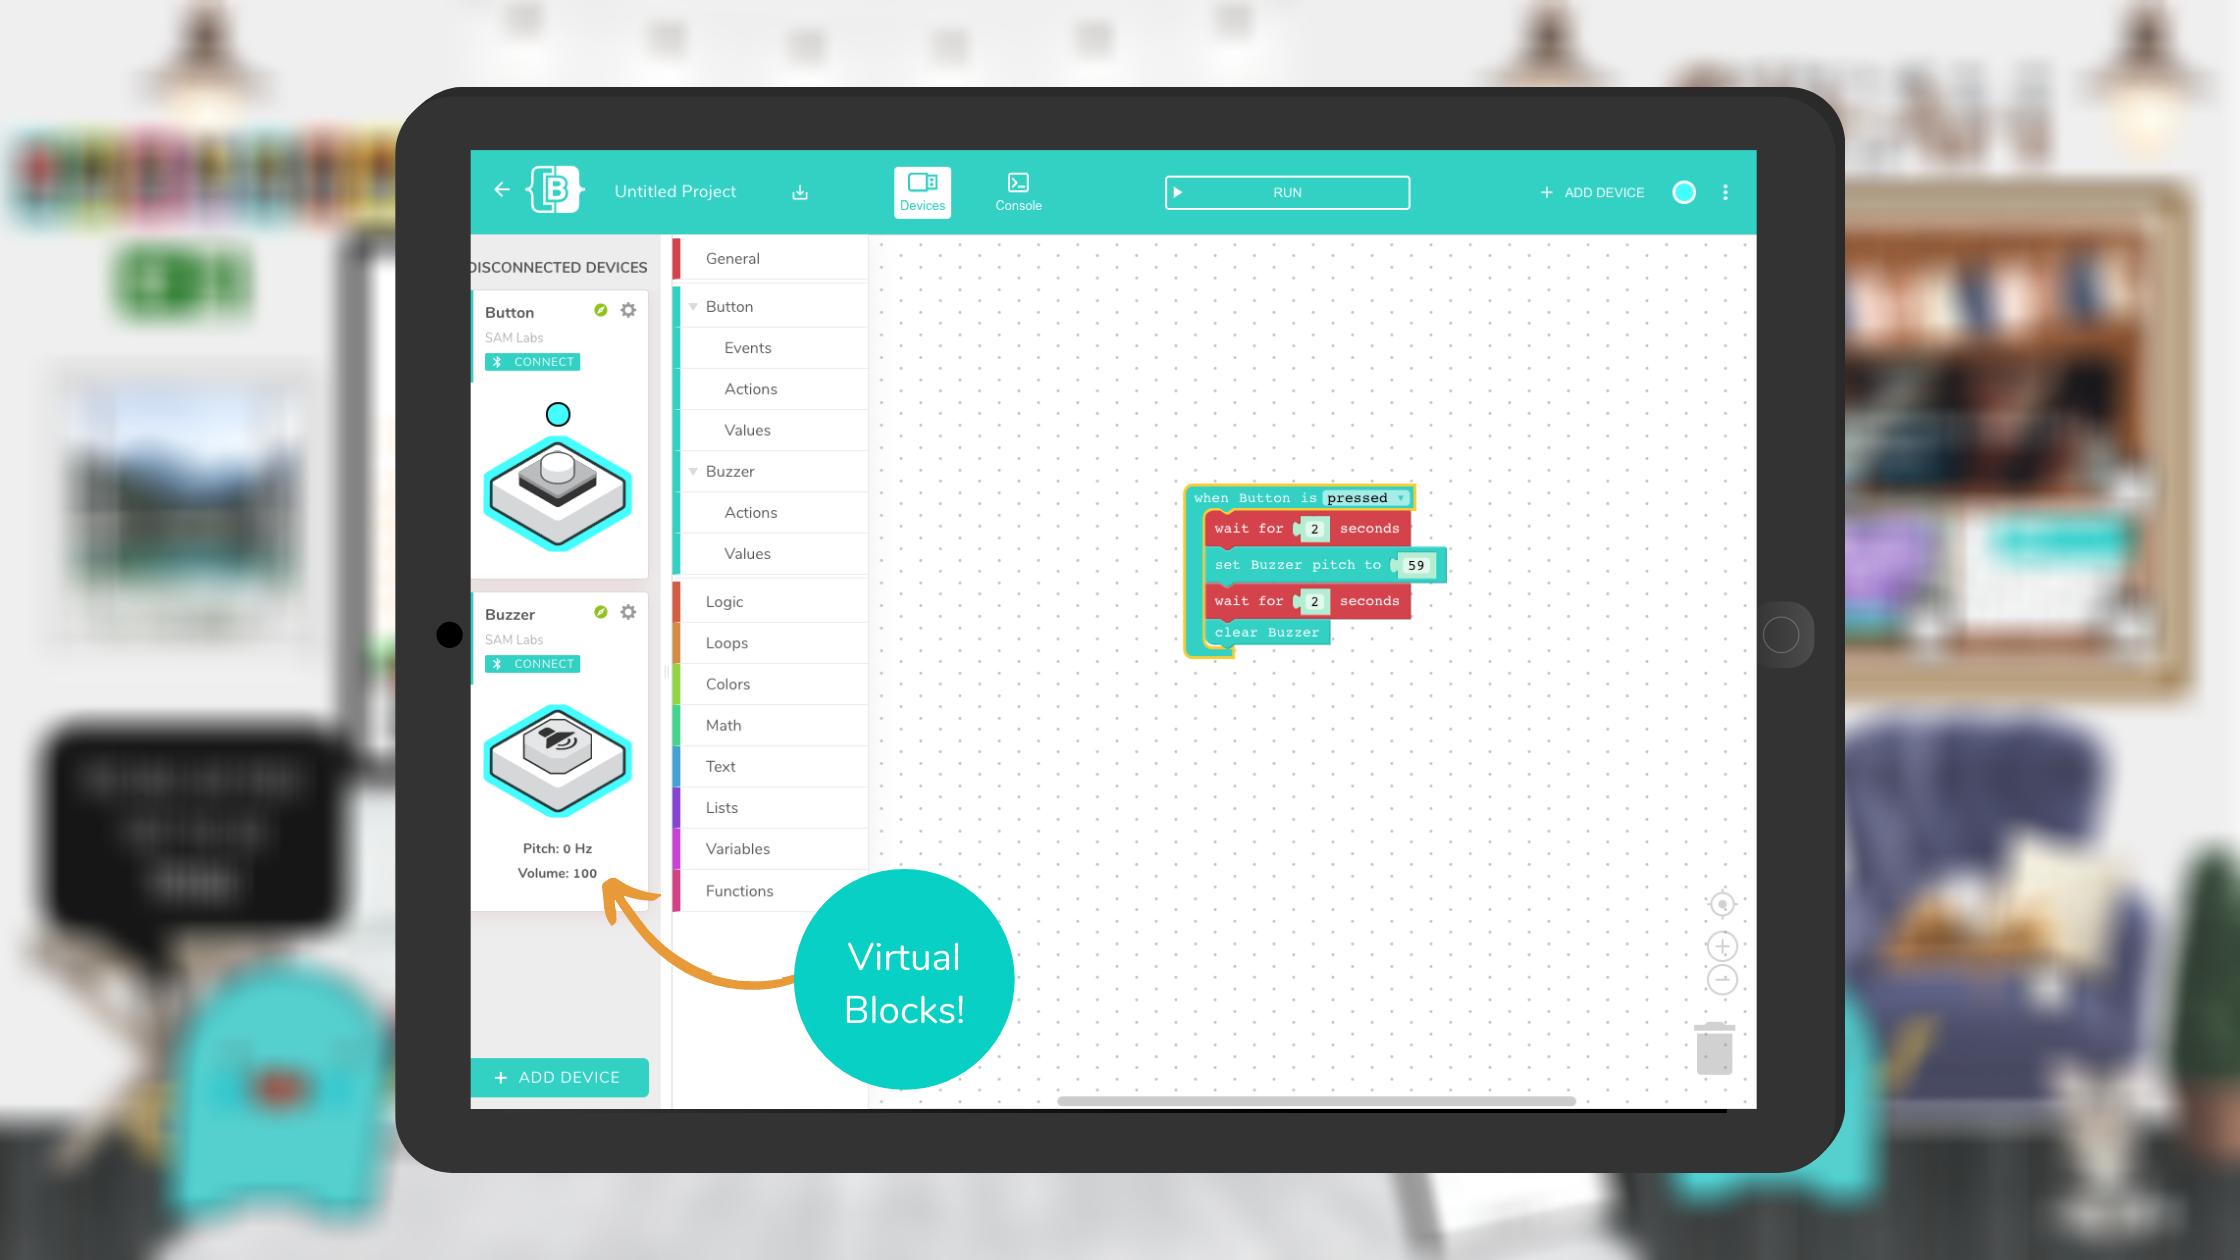 Virtual Block capabilities in SAM Blockly within SAM Studio's coding platform.